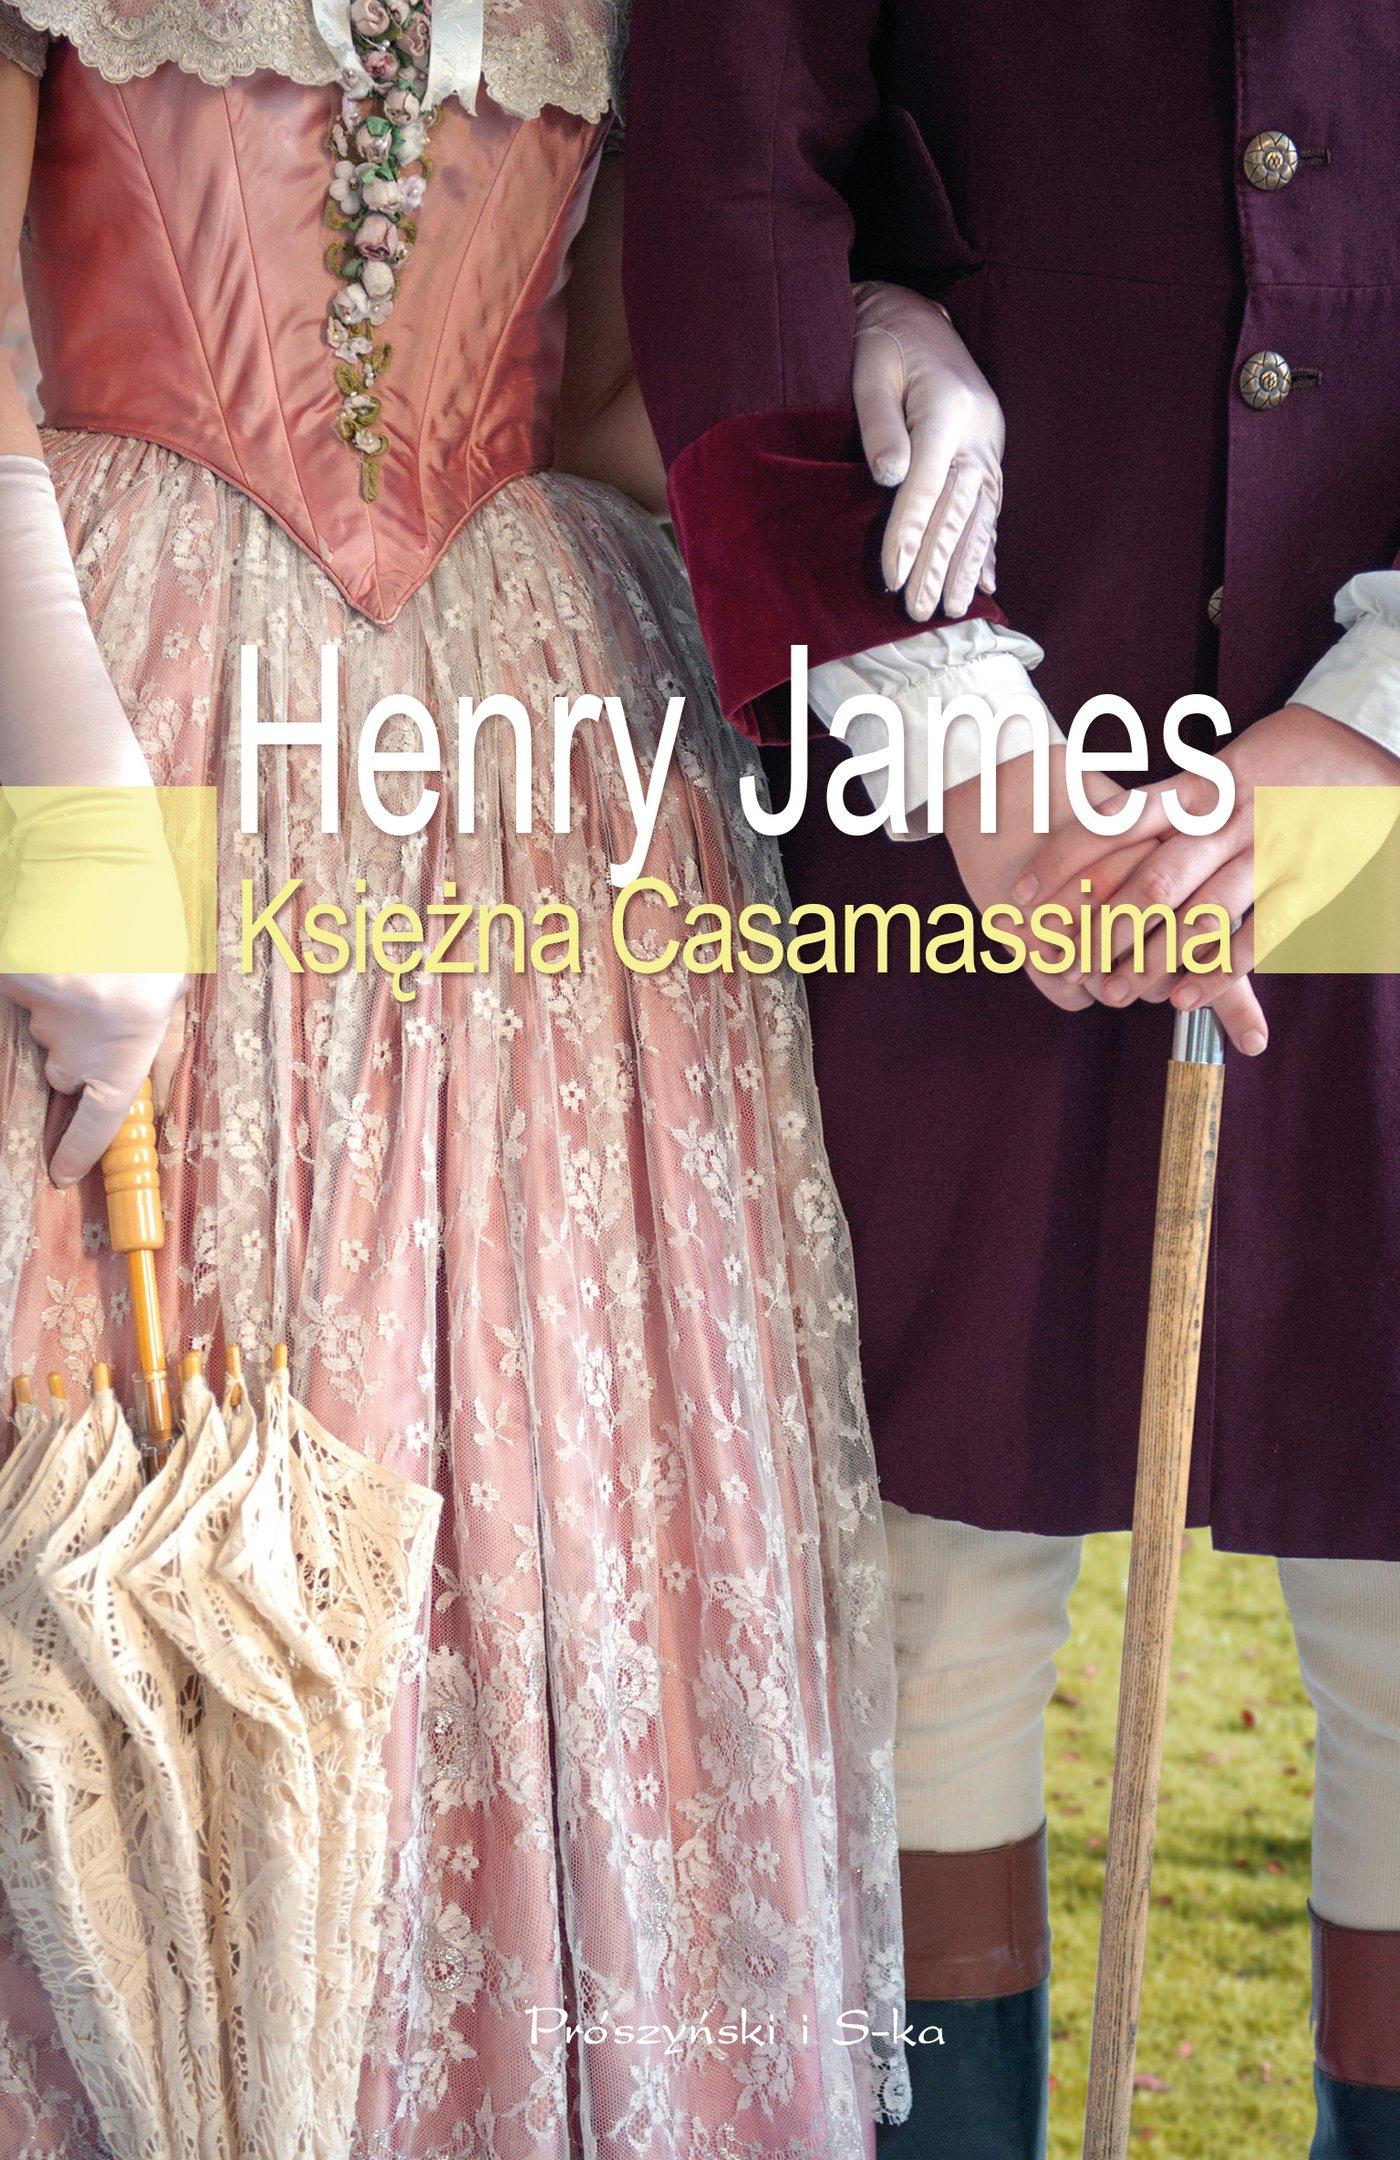 Księżna Casamassima - Ebook (Książka na Kindle) do pobrania w formacie MOBI